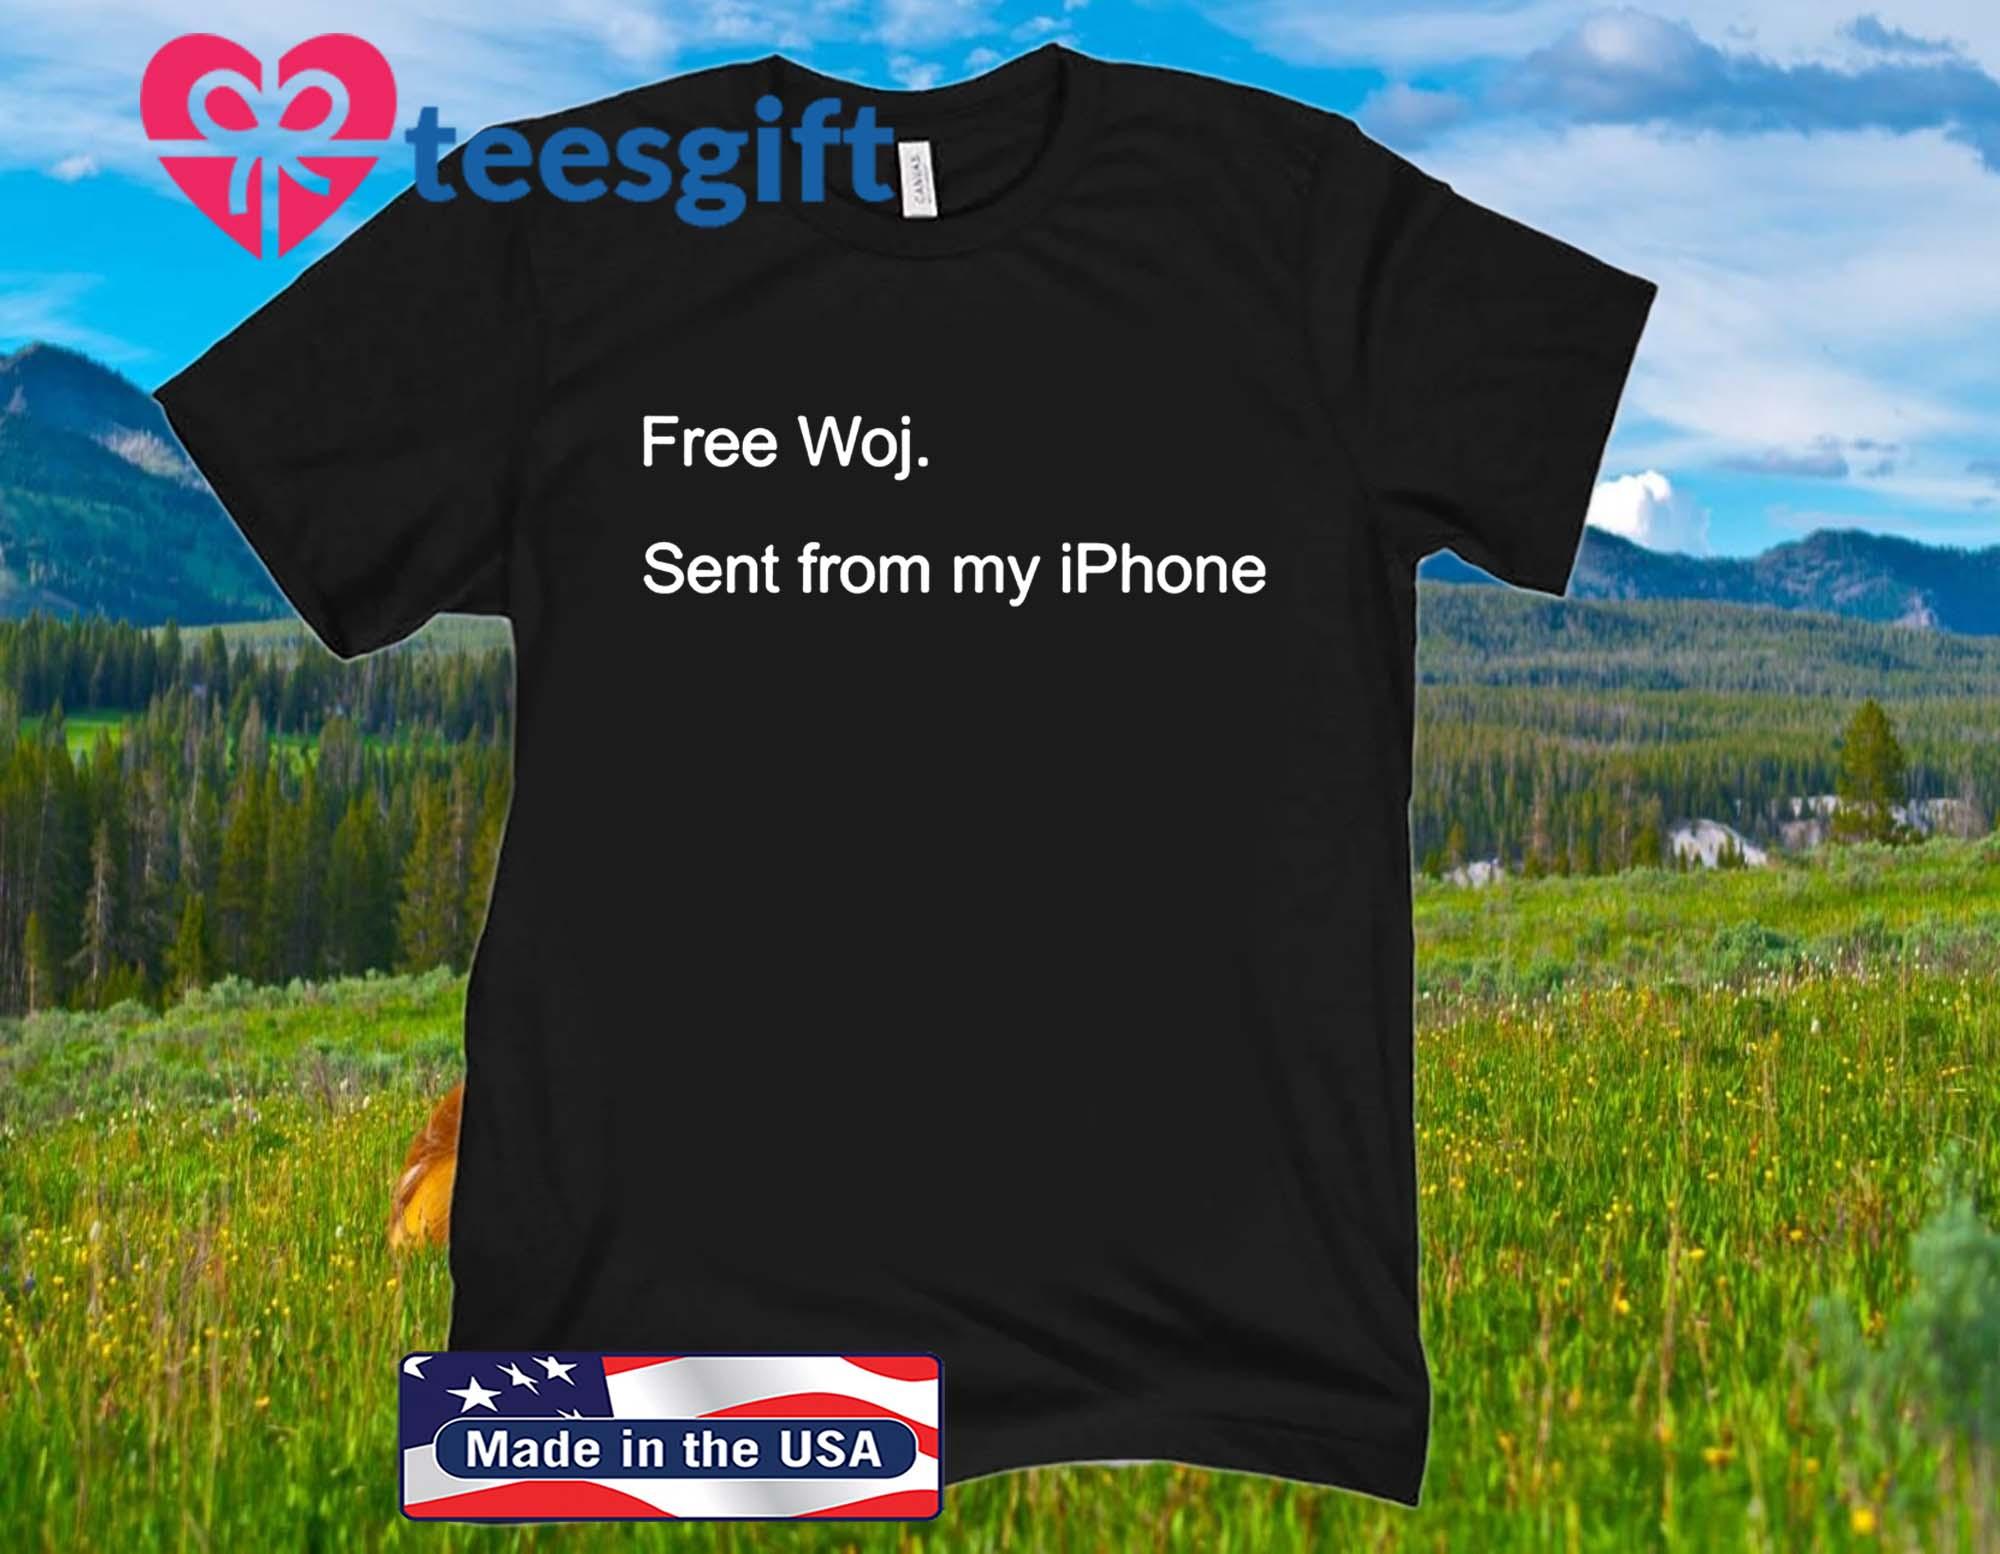 FREE WOJ. SENT FROM MY IPHONE SHIRT